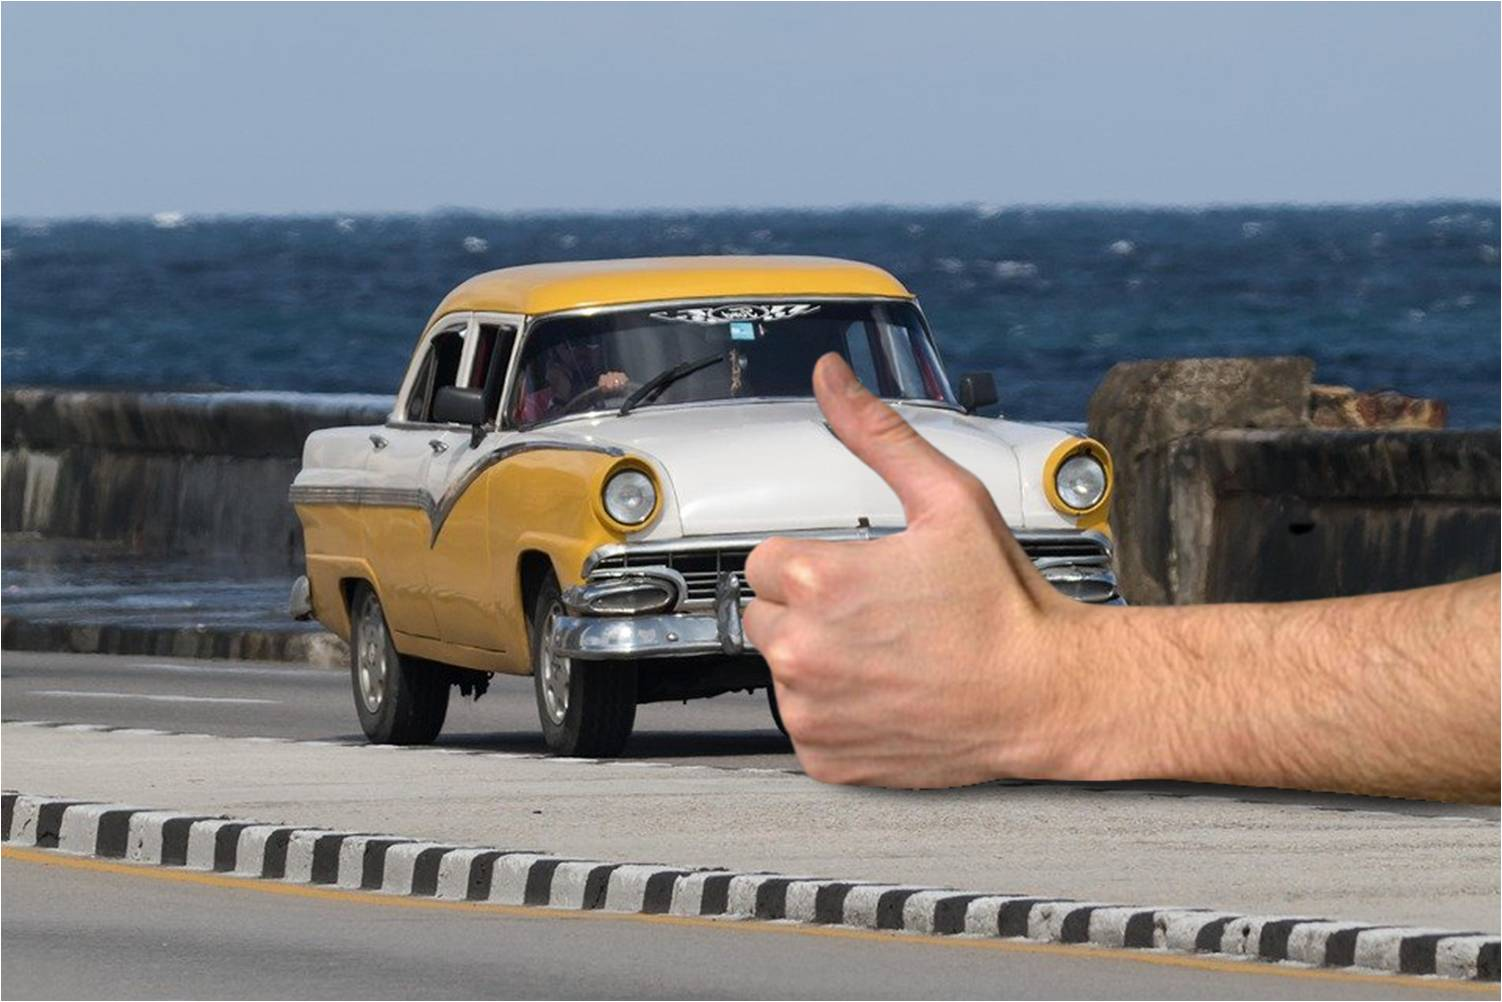 Coger botella en Cuba